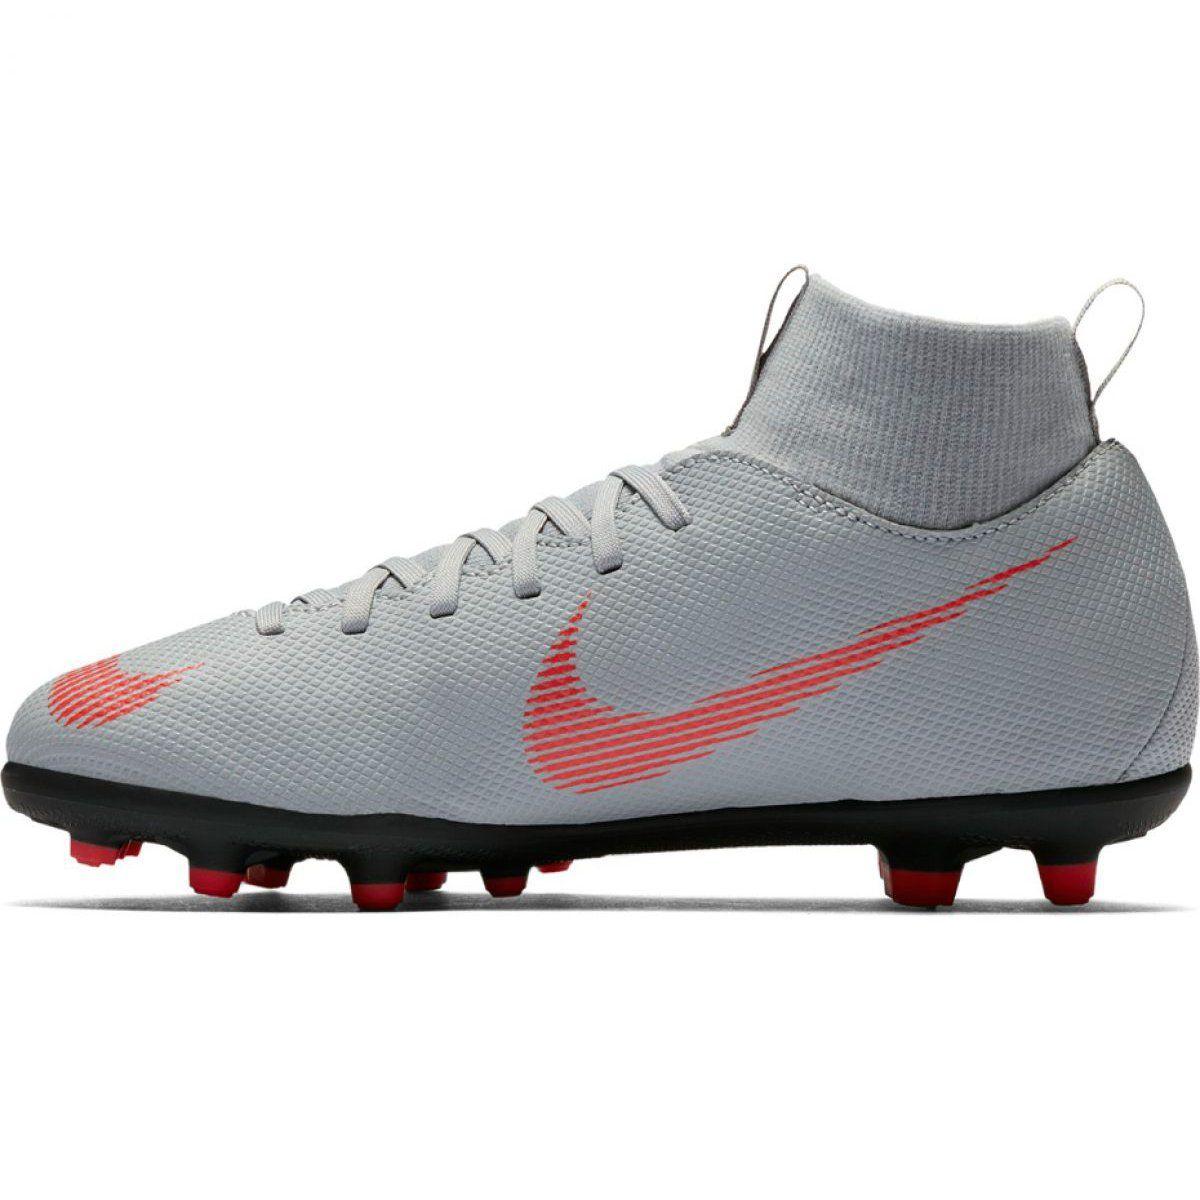 Football Shoes Nike Mercurial Superfly 6 Club Mg Jr Ah7339 060 White Football Shoes Nike Shoes Superfly